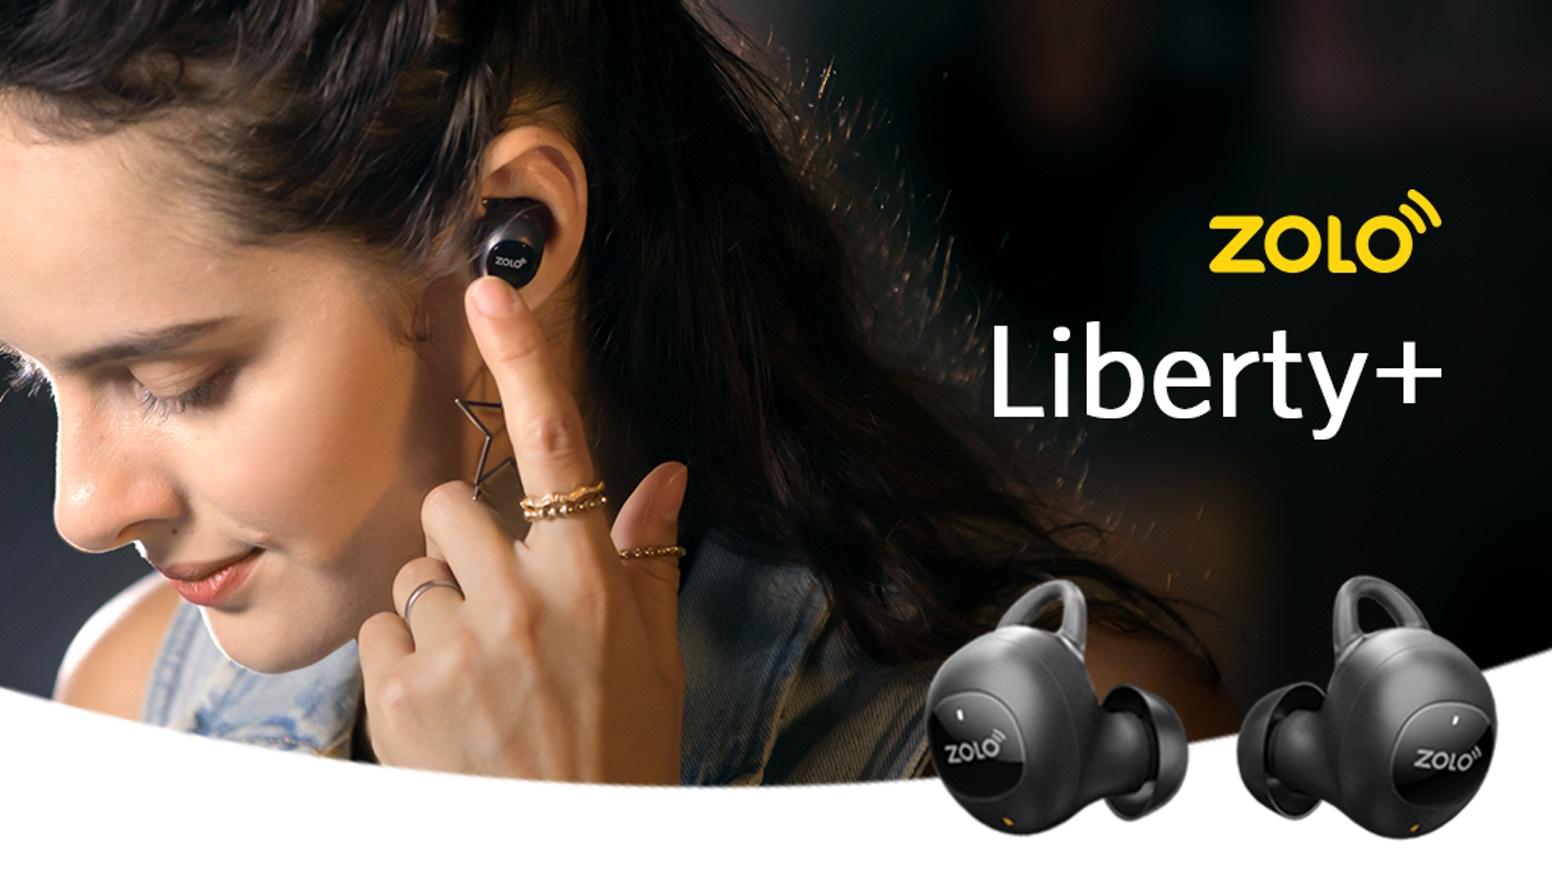 Zolo Liberty+ (Anker) kabellose Kopfhörer, ähnlich AirPods